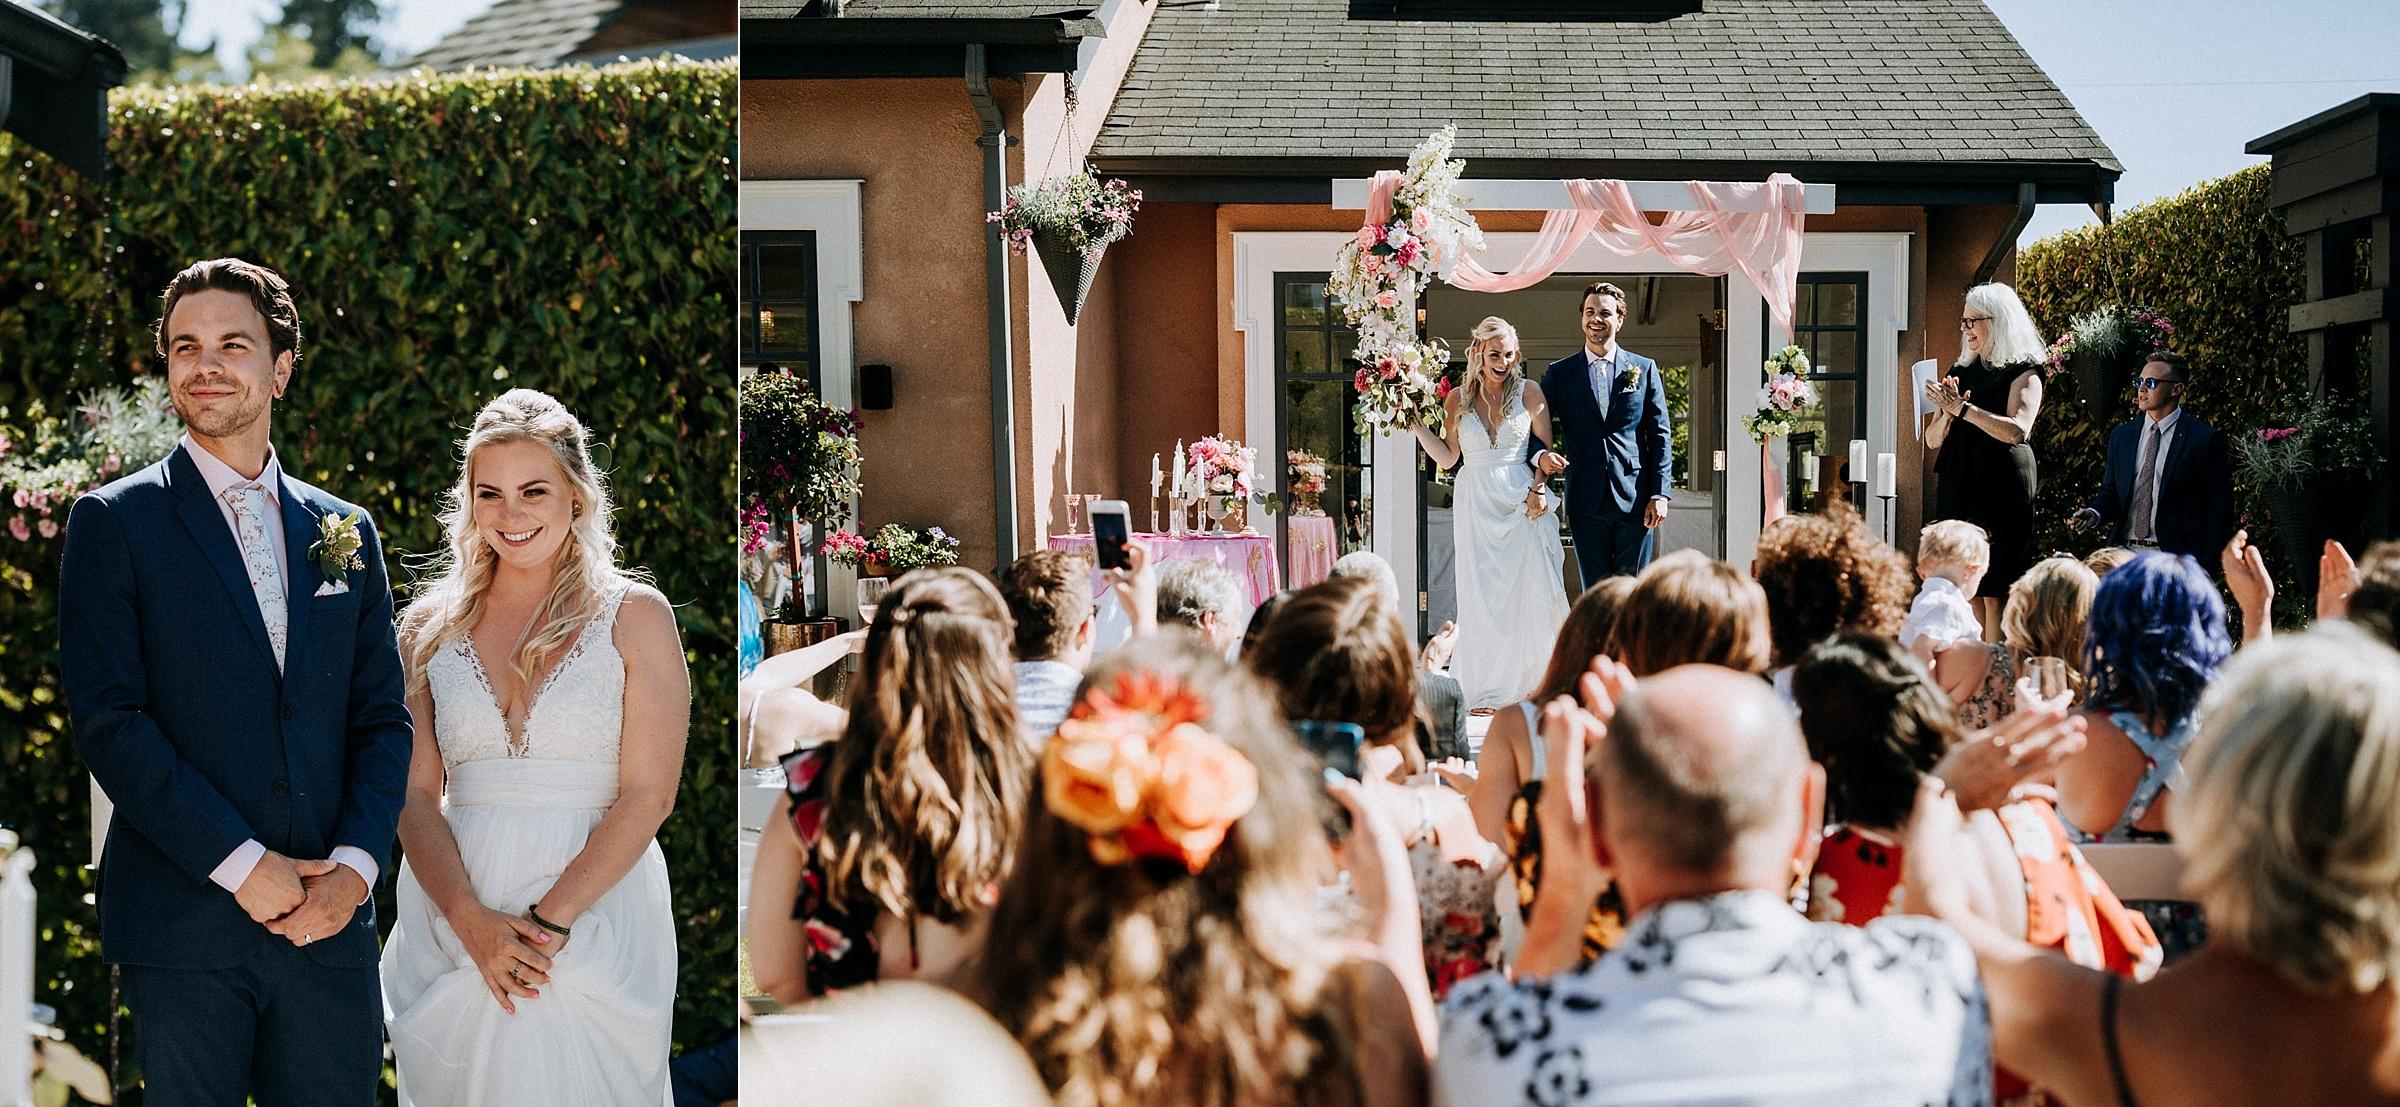 ceremonyWest Vancouver backyard wedding photographer